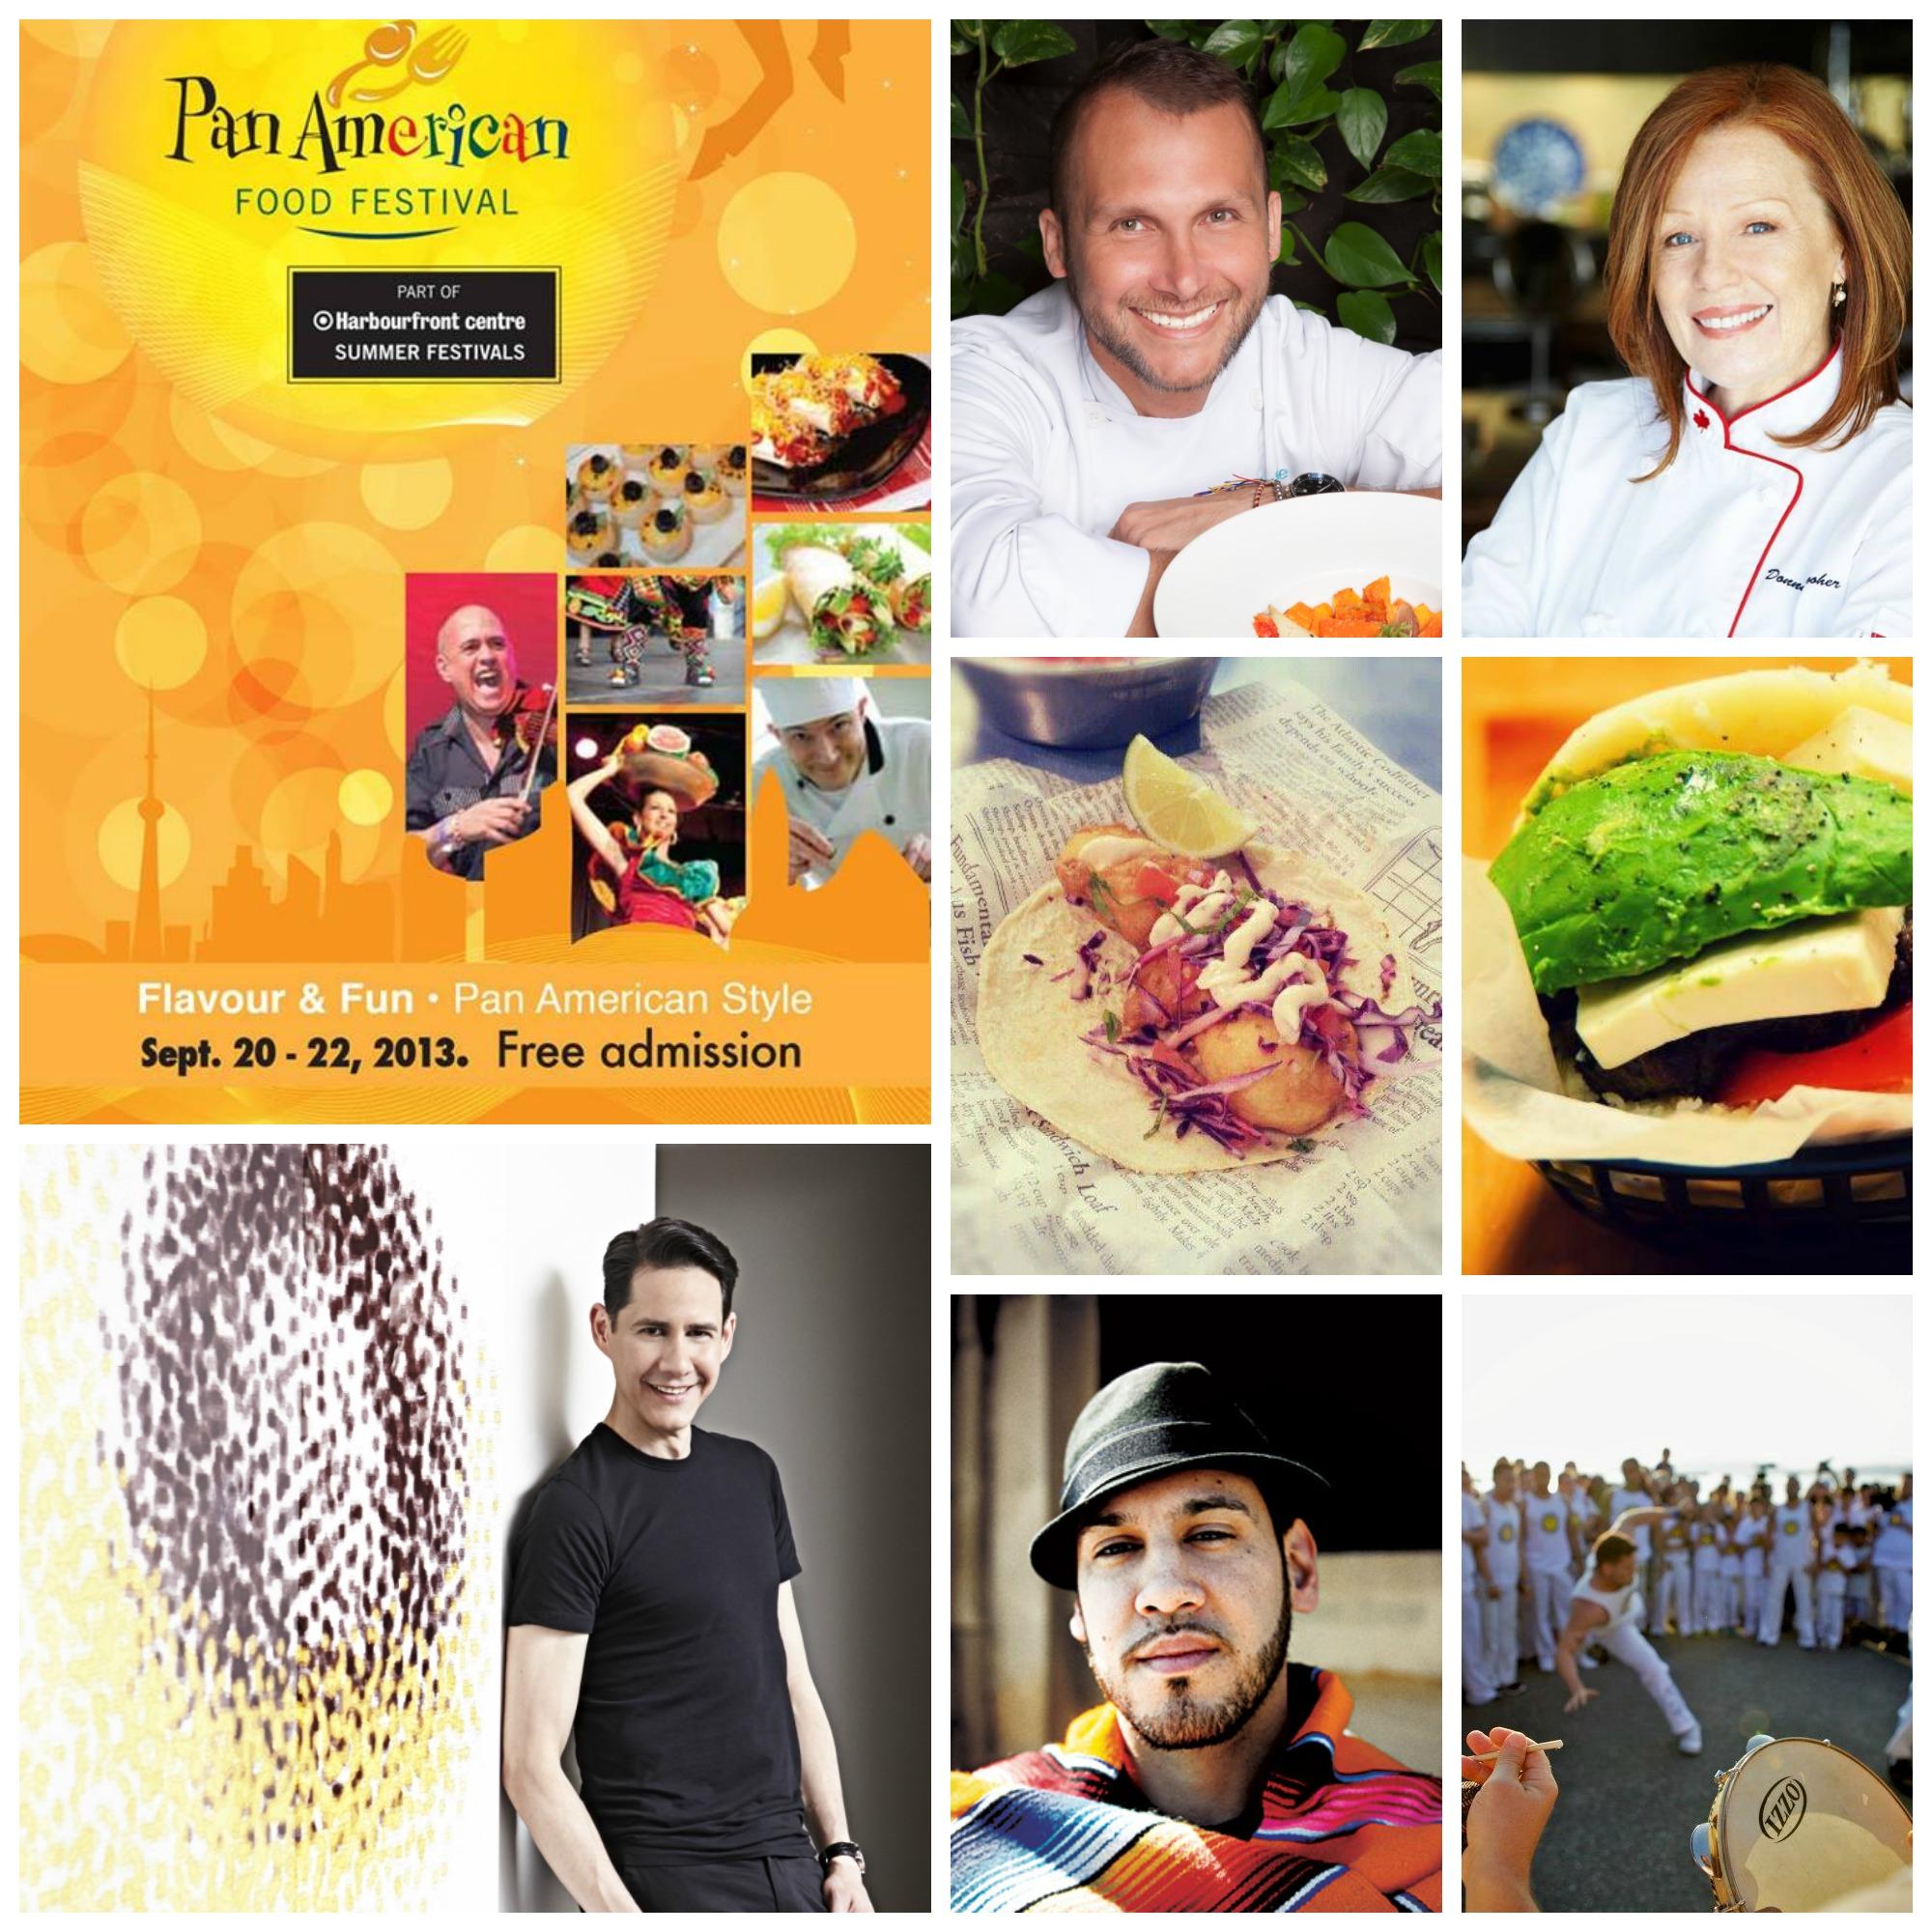 panamericanfoodfestival